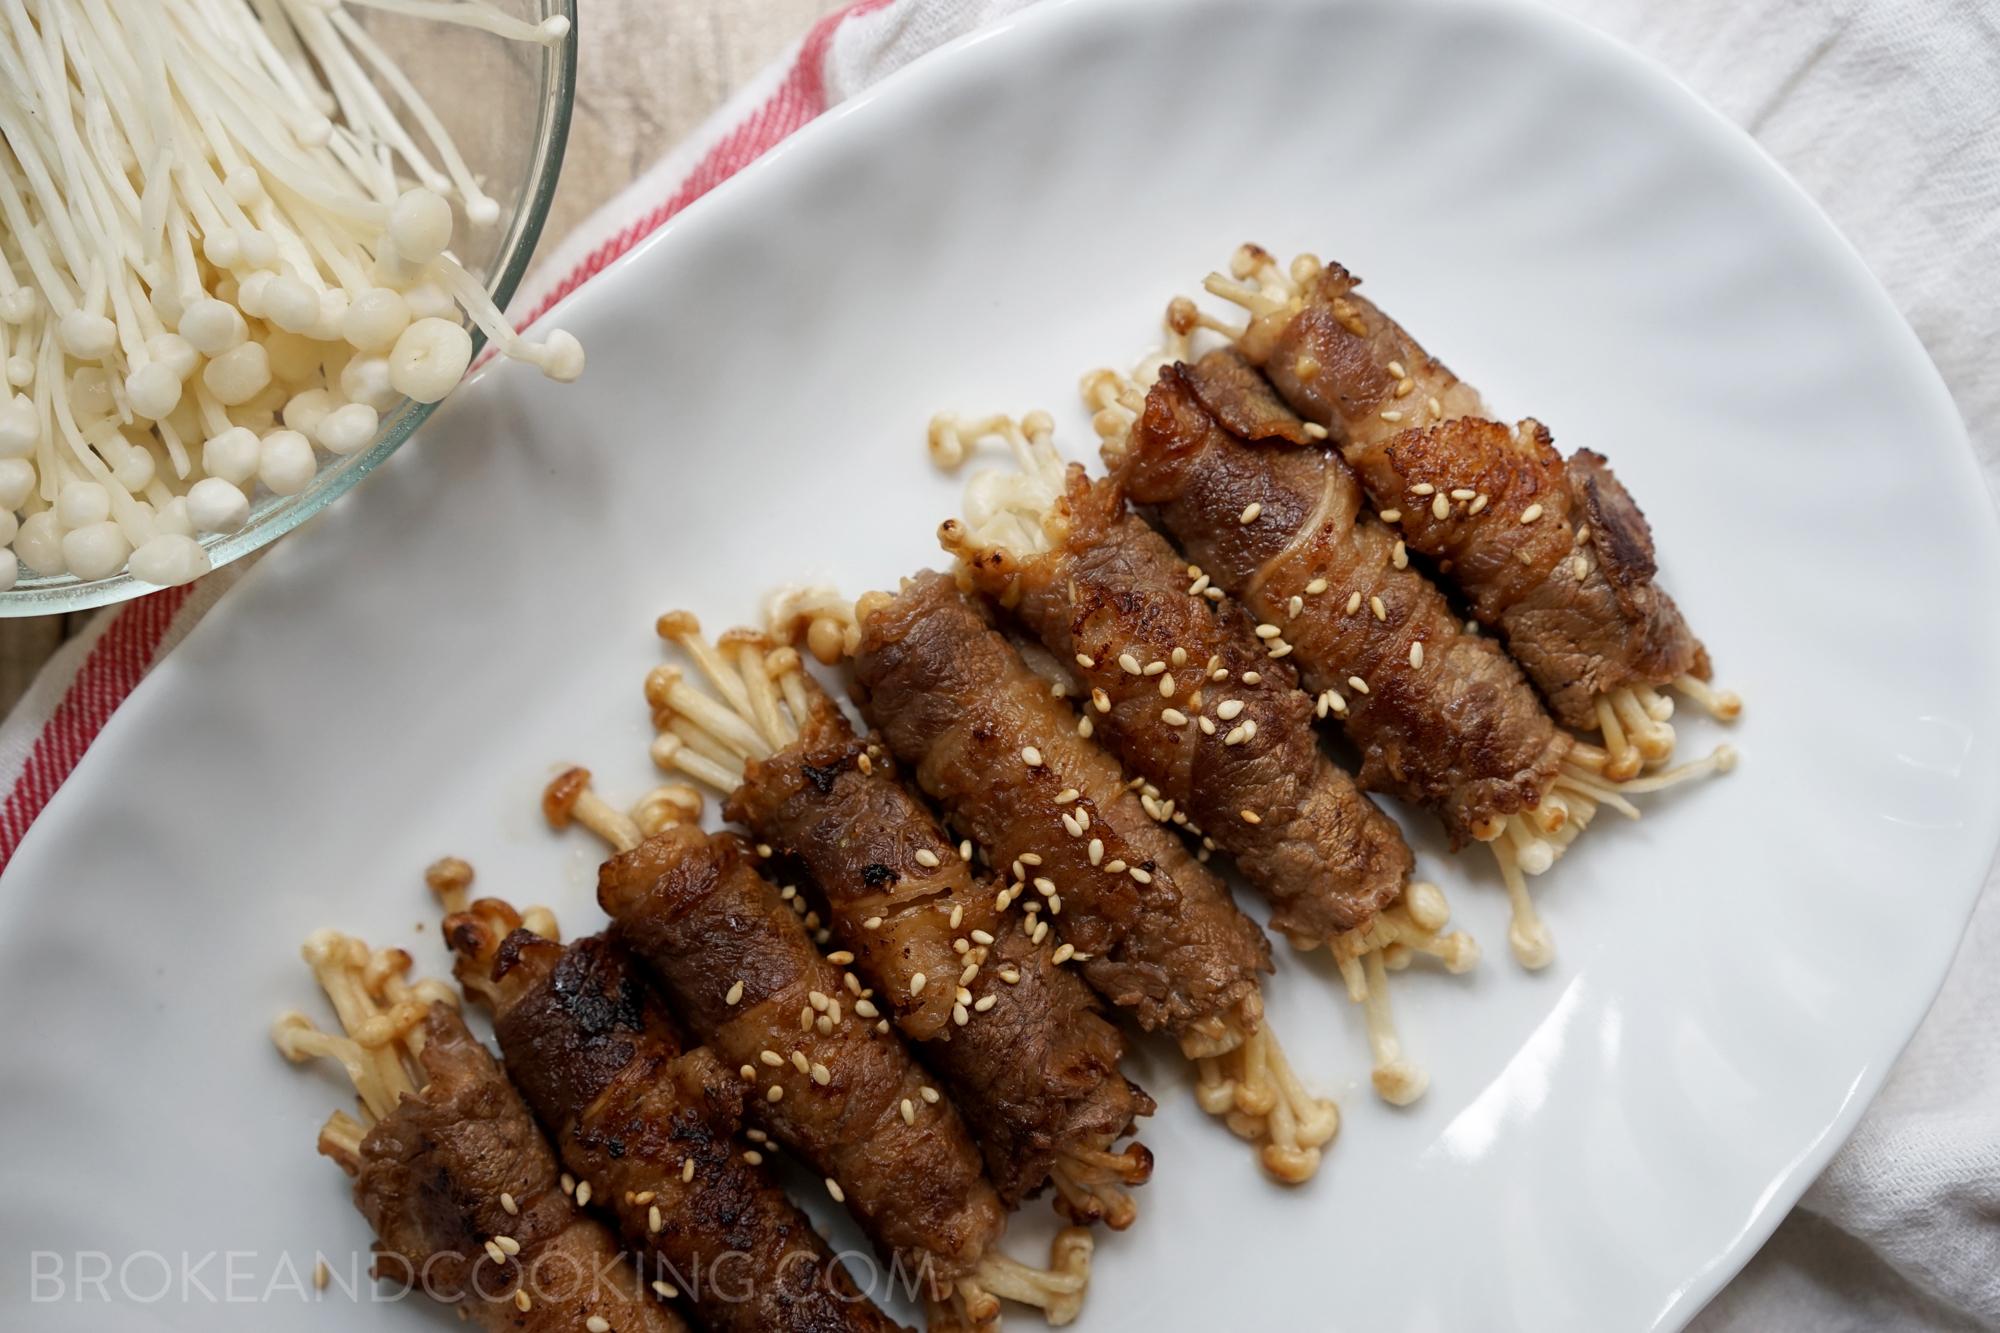 Beef Enoki Rolls Recipe by Broke and Cooking - www.brokeandcooking.com